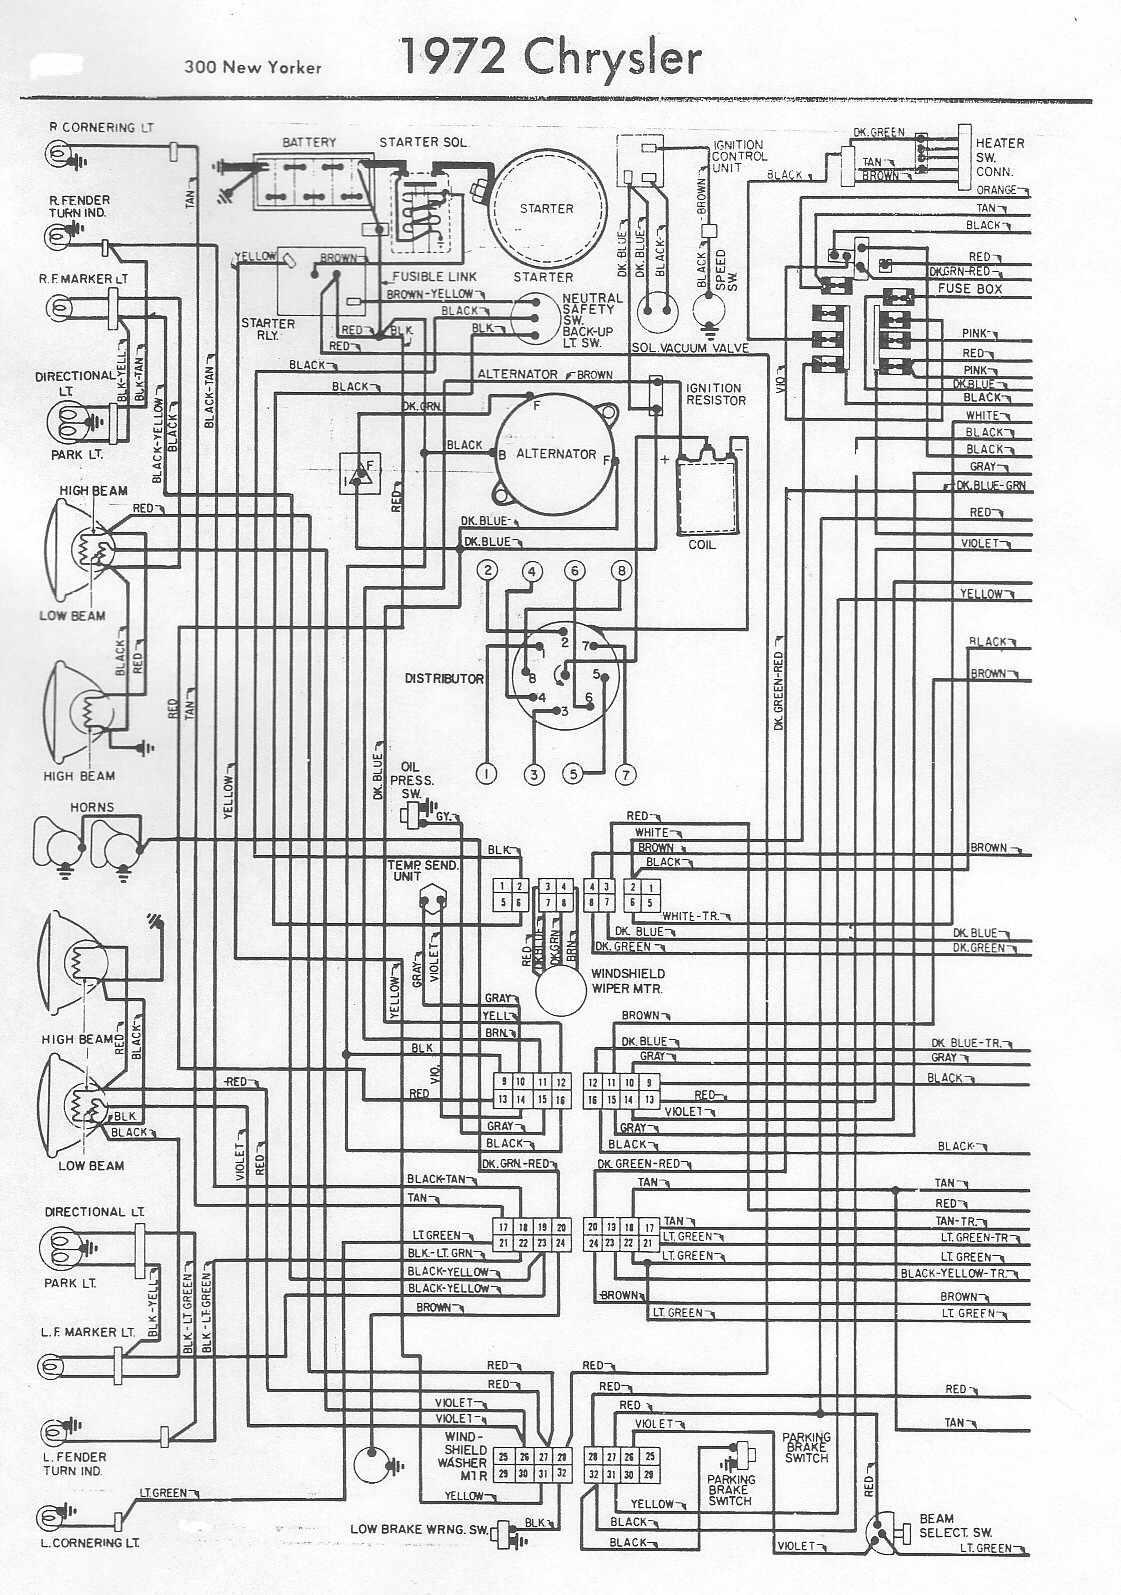 1985 chrysler new yorker wiring diagram best secret wiring diagram u2022 1985 chrysler 5th avenue 1985 chrysler lebaron wiring diagram [ 1121 x 1595 Pixel ]